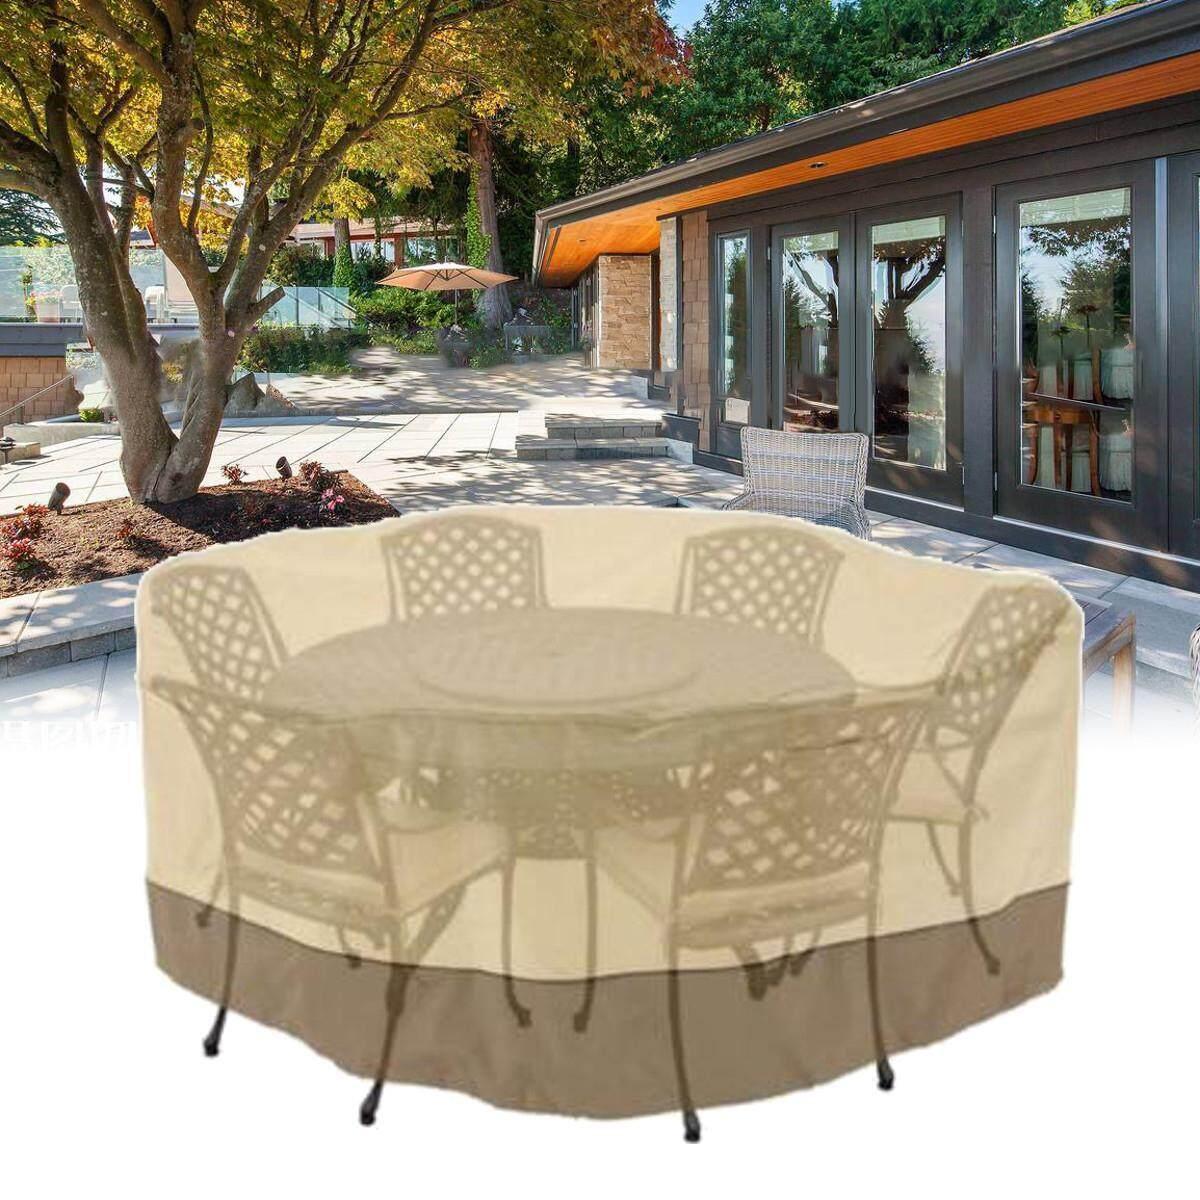 (photo)94 Veranda Patio Set Cover Table & Chair Outdoor Garden Furniture Round , Large